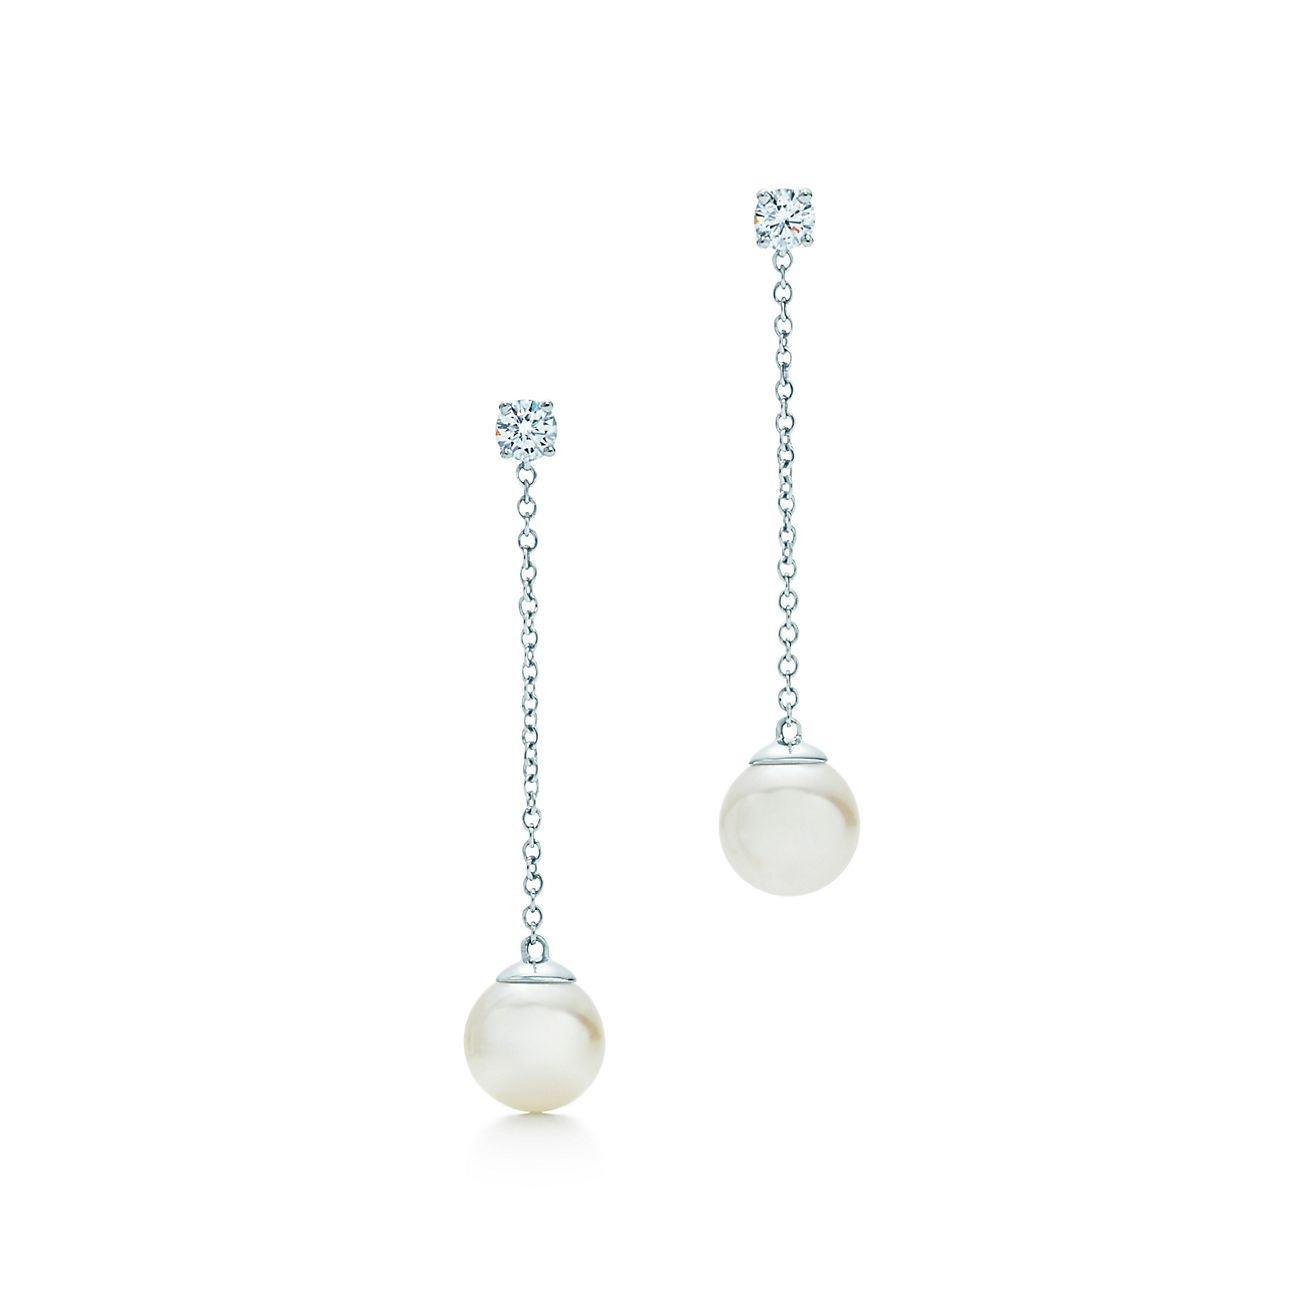 ac5d98335d8d3b tiffany drop pearl earrings